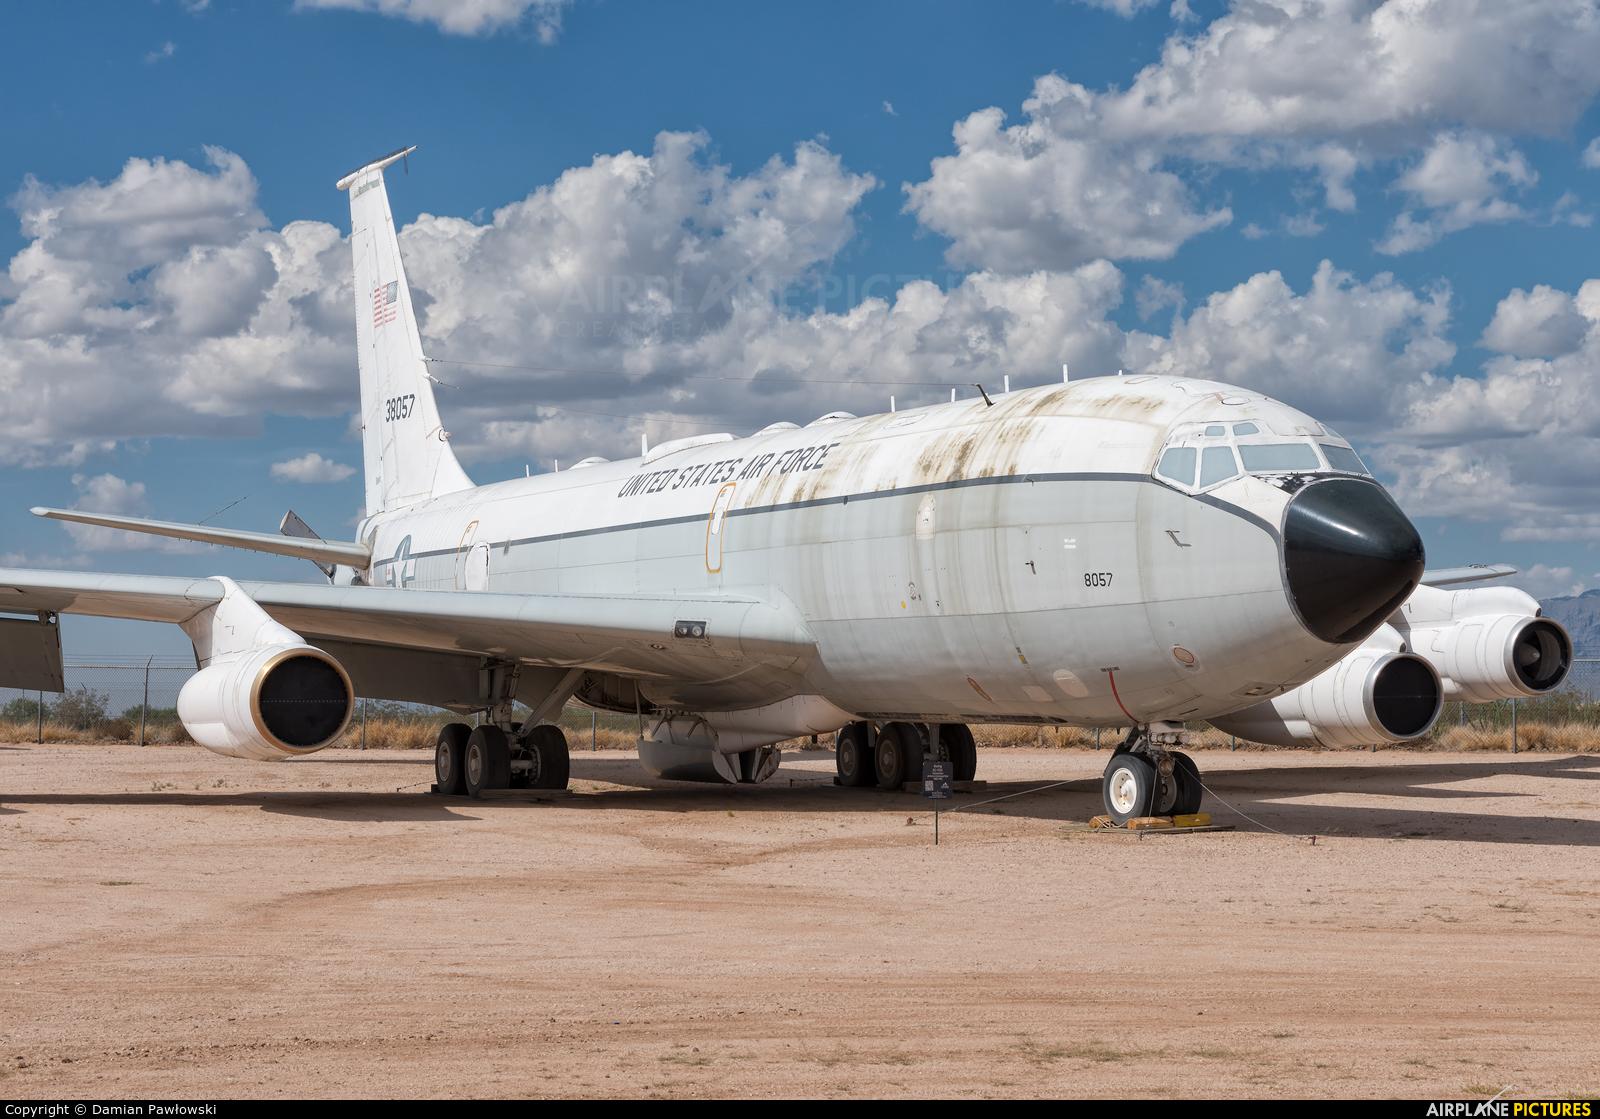 USA - Air Force 63-8057 aircraft at Tucson - Pima Air & Space Museum